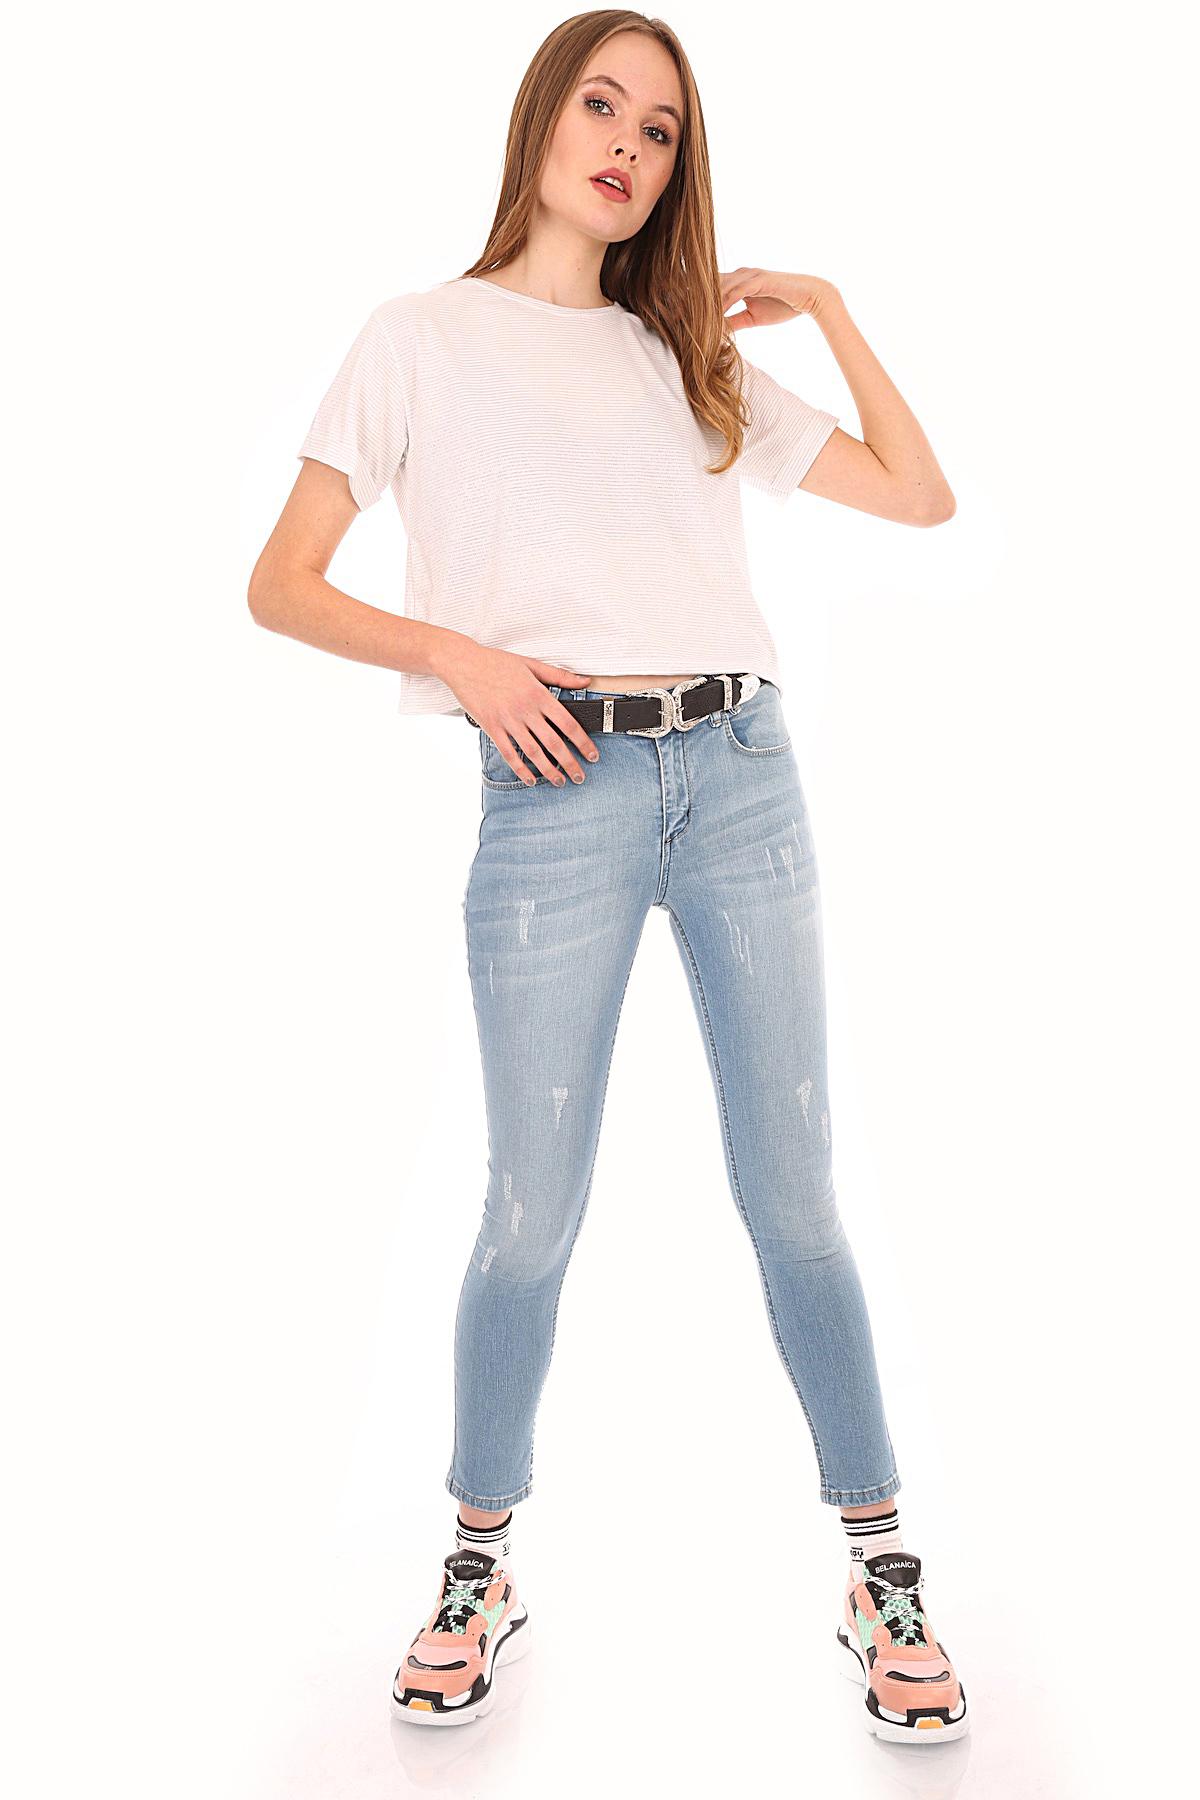 Women's Pocket Light Blue Jeans